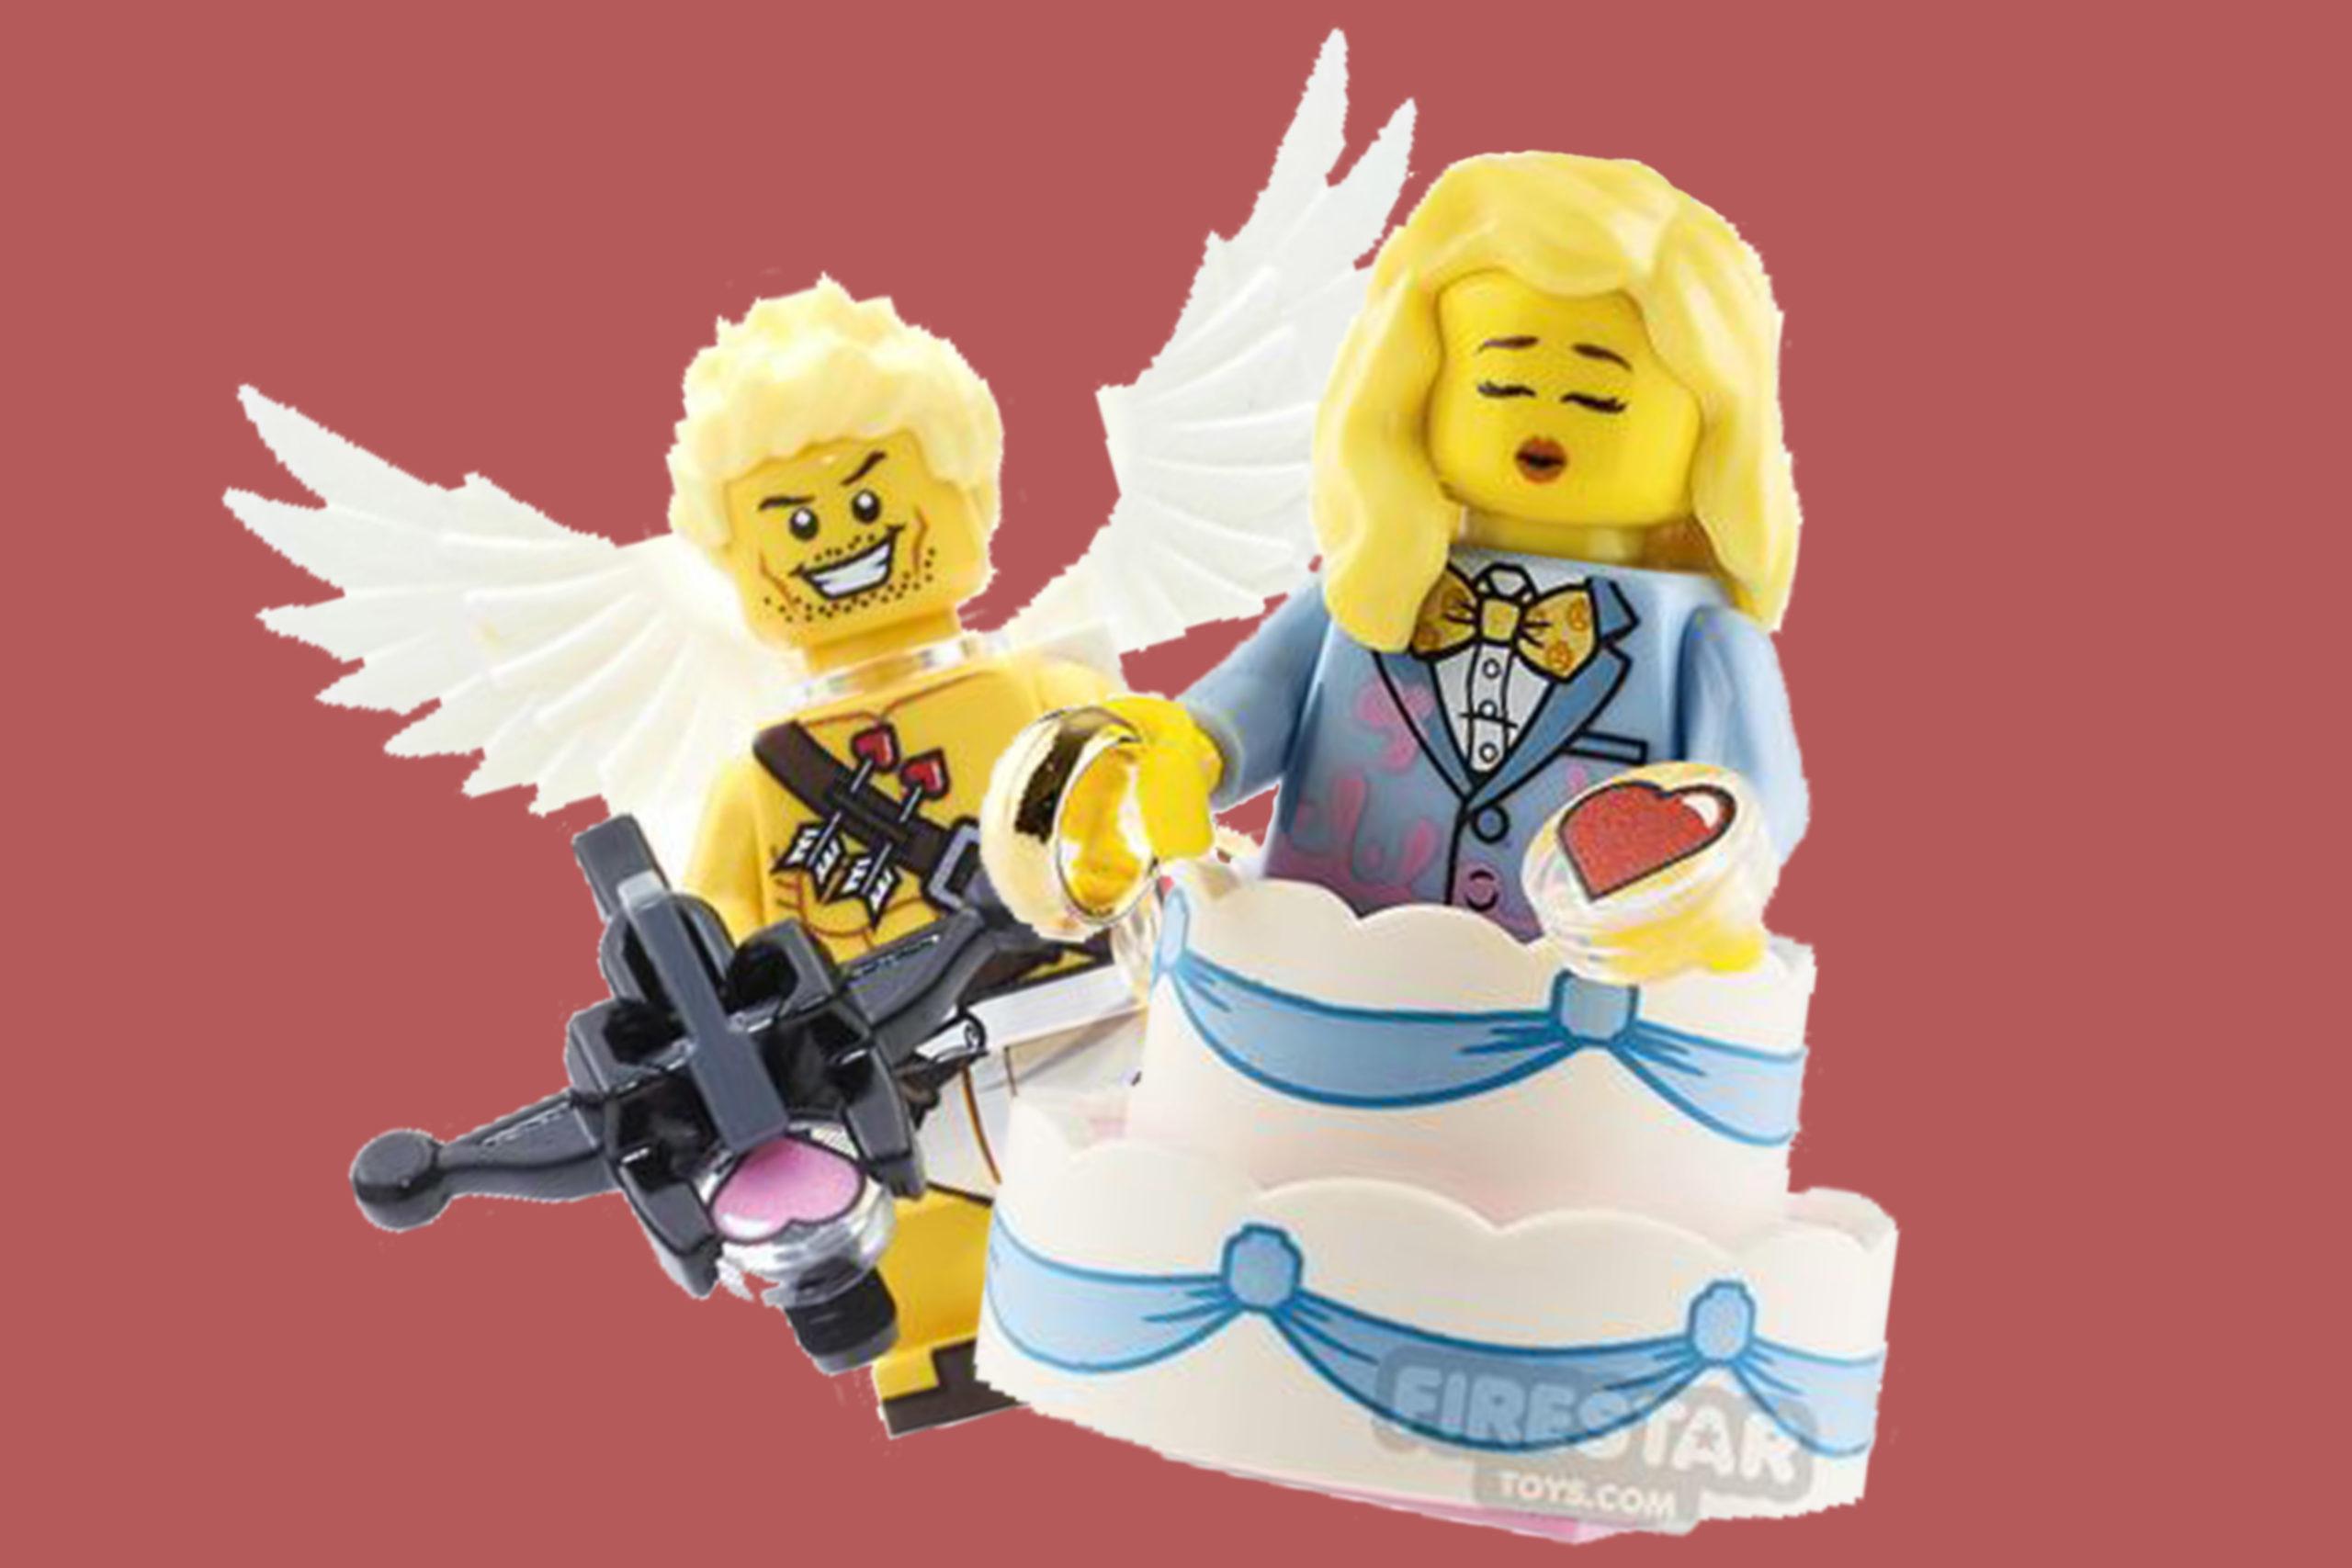 LEGO Valentine's Day - Custom Minifigures